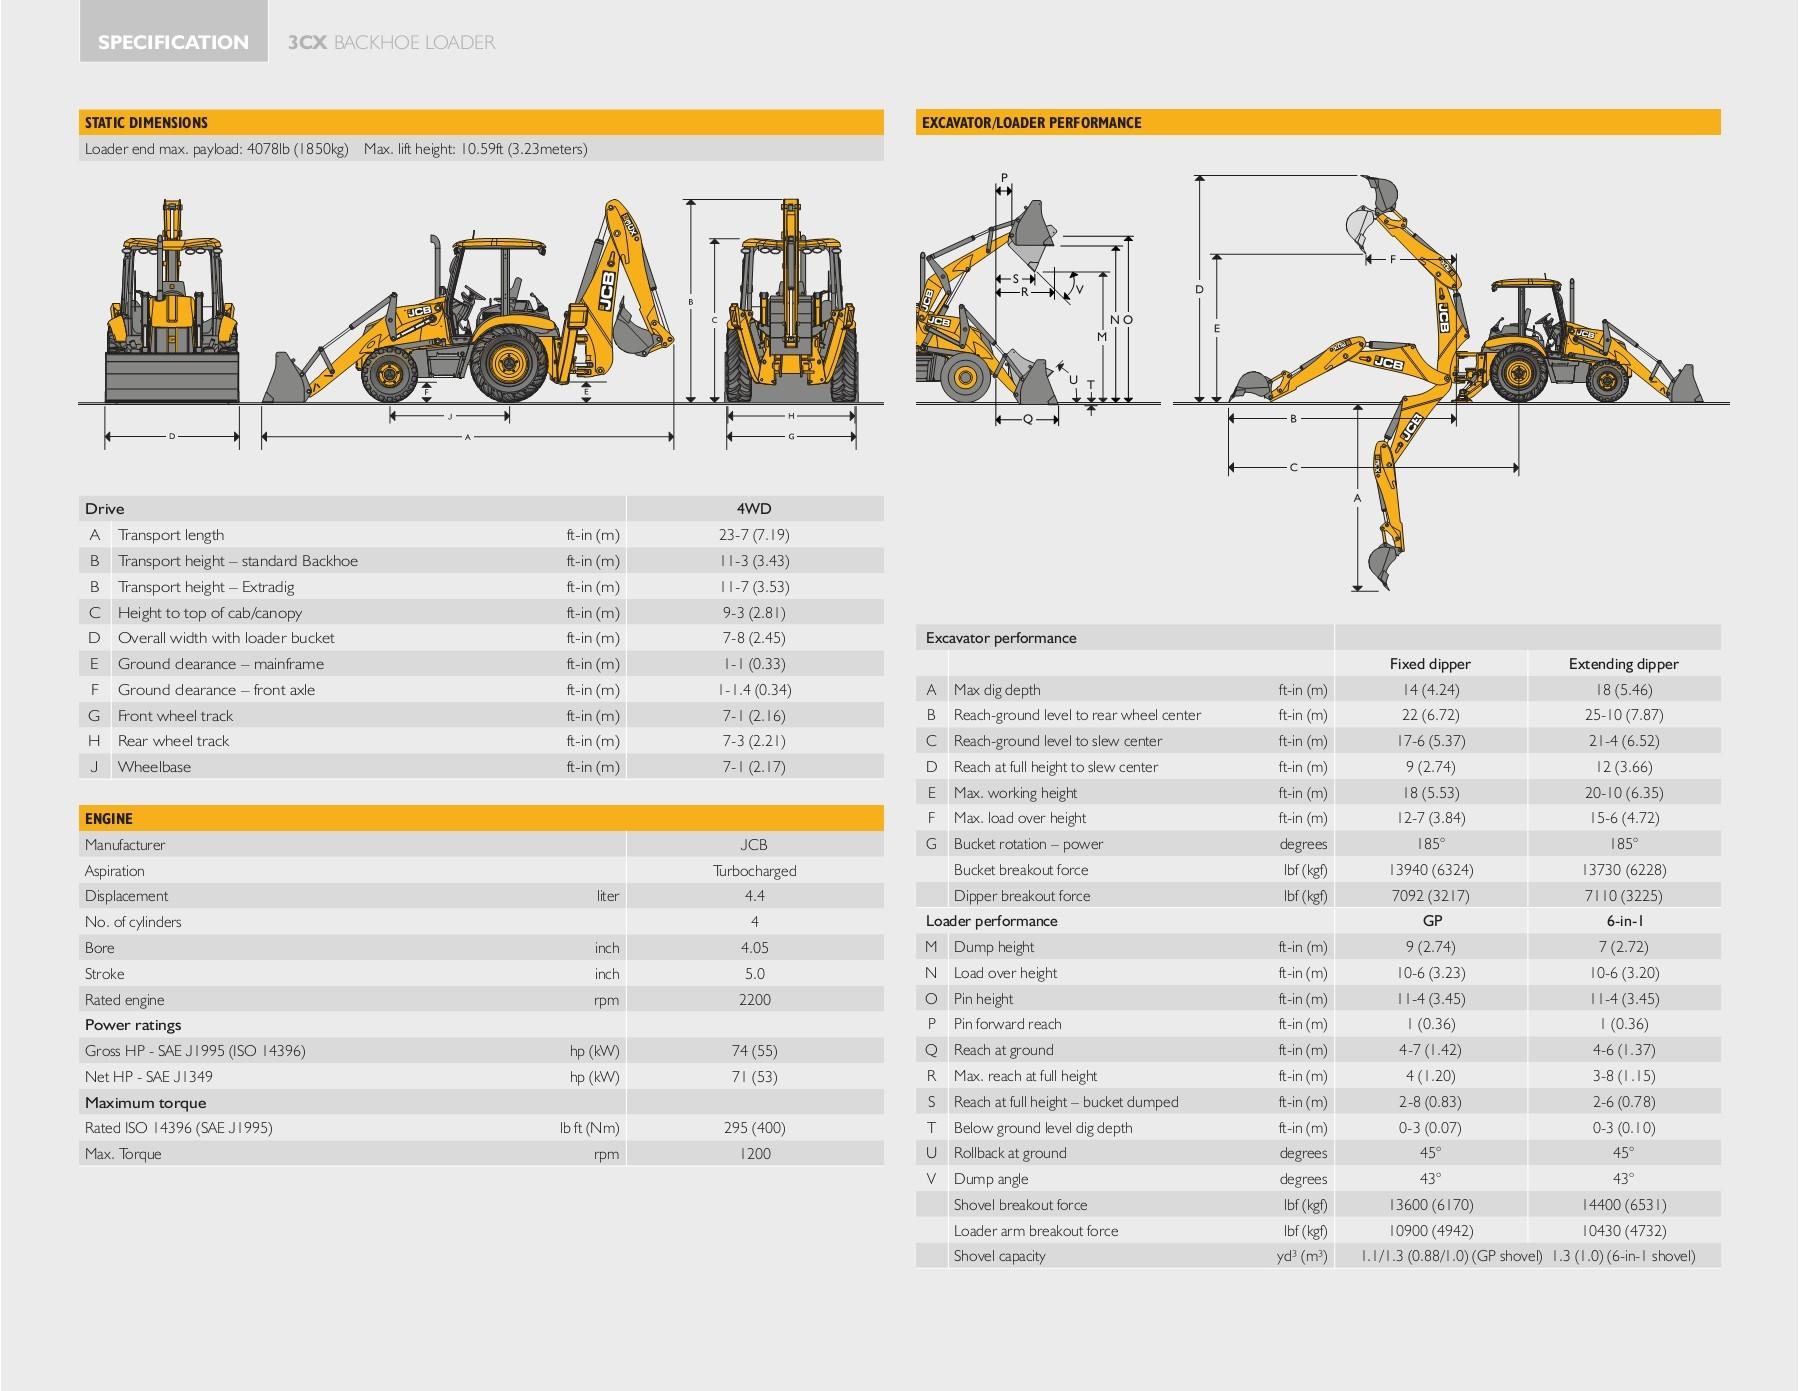 jcb 3cx backhoe wiring diagram jcb 210s backhoe wiring diagram ford 3000 tractor wiring [ 1800 x 1391 Pixel ]